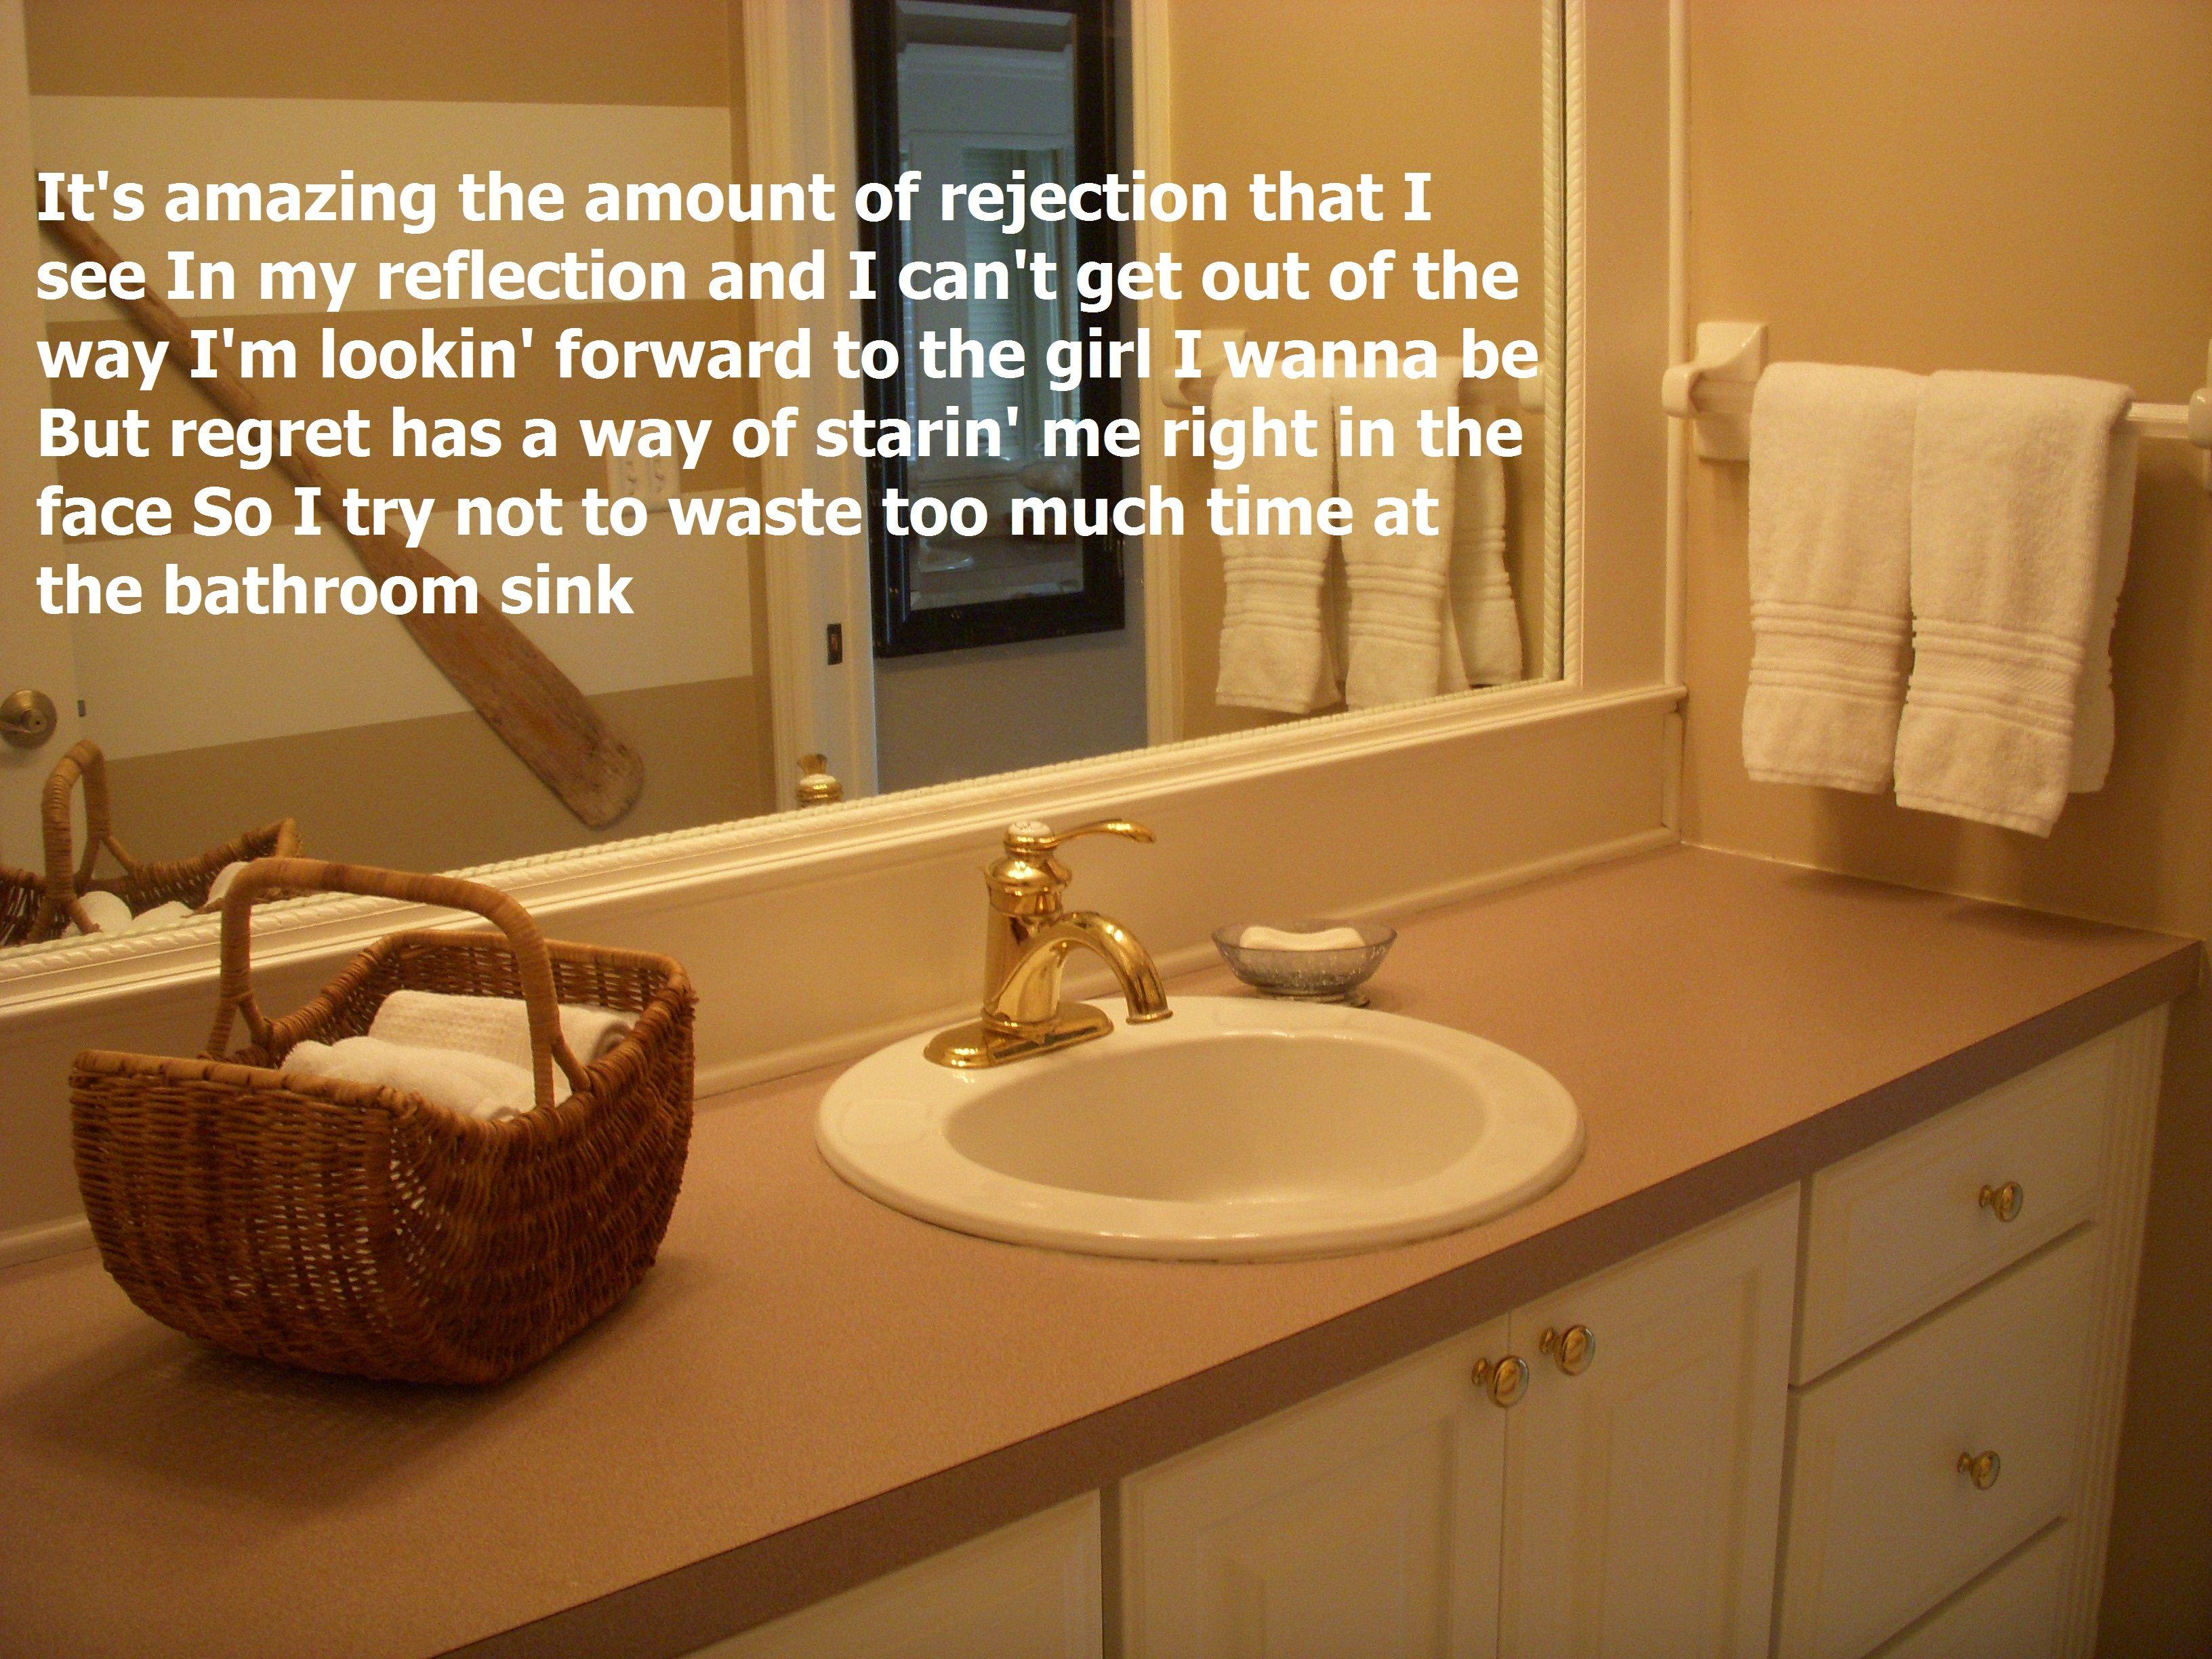 bathroom sink-miranda lambert. i made my own pin of these lyrics